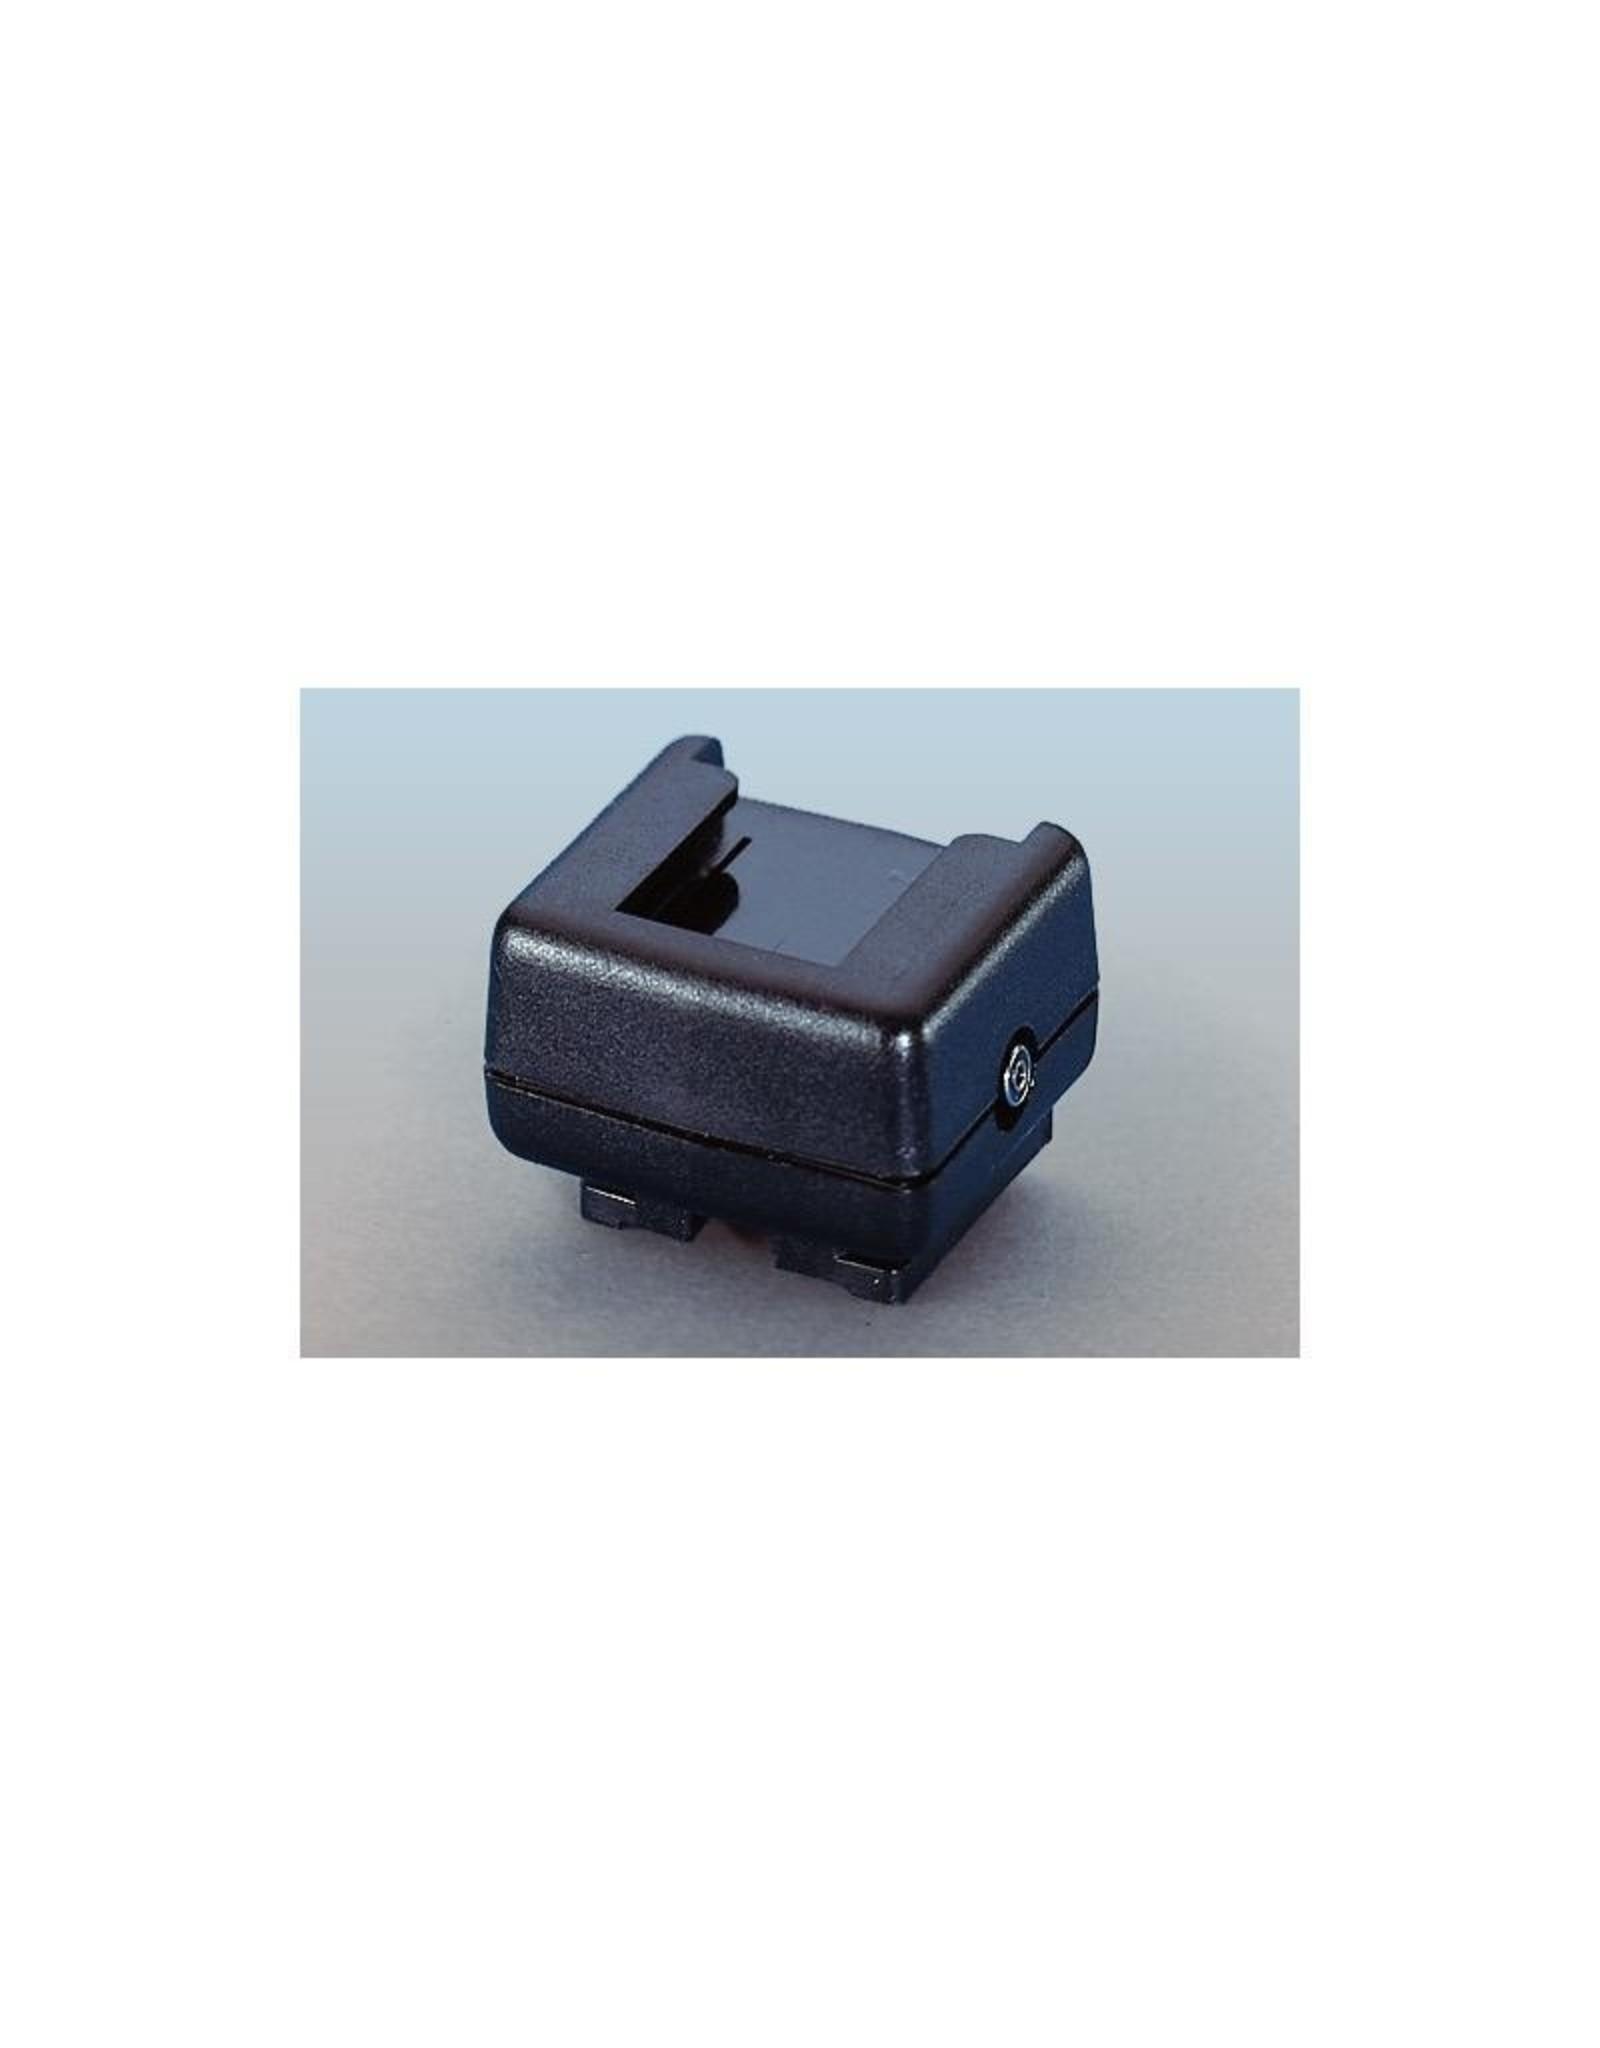 Kaiser Kaiser Flash Shoe Adapter with hot flash contact